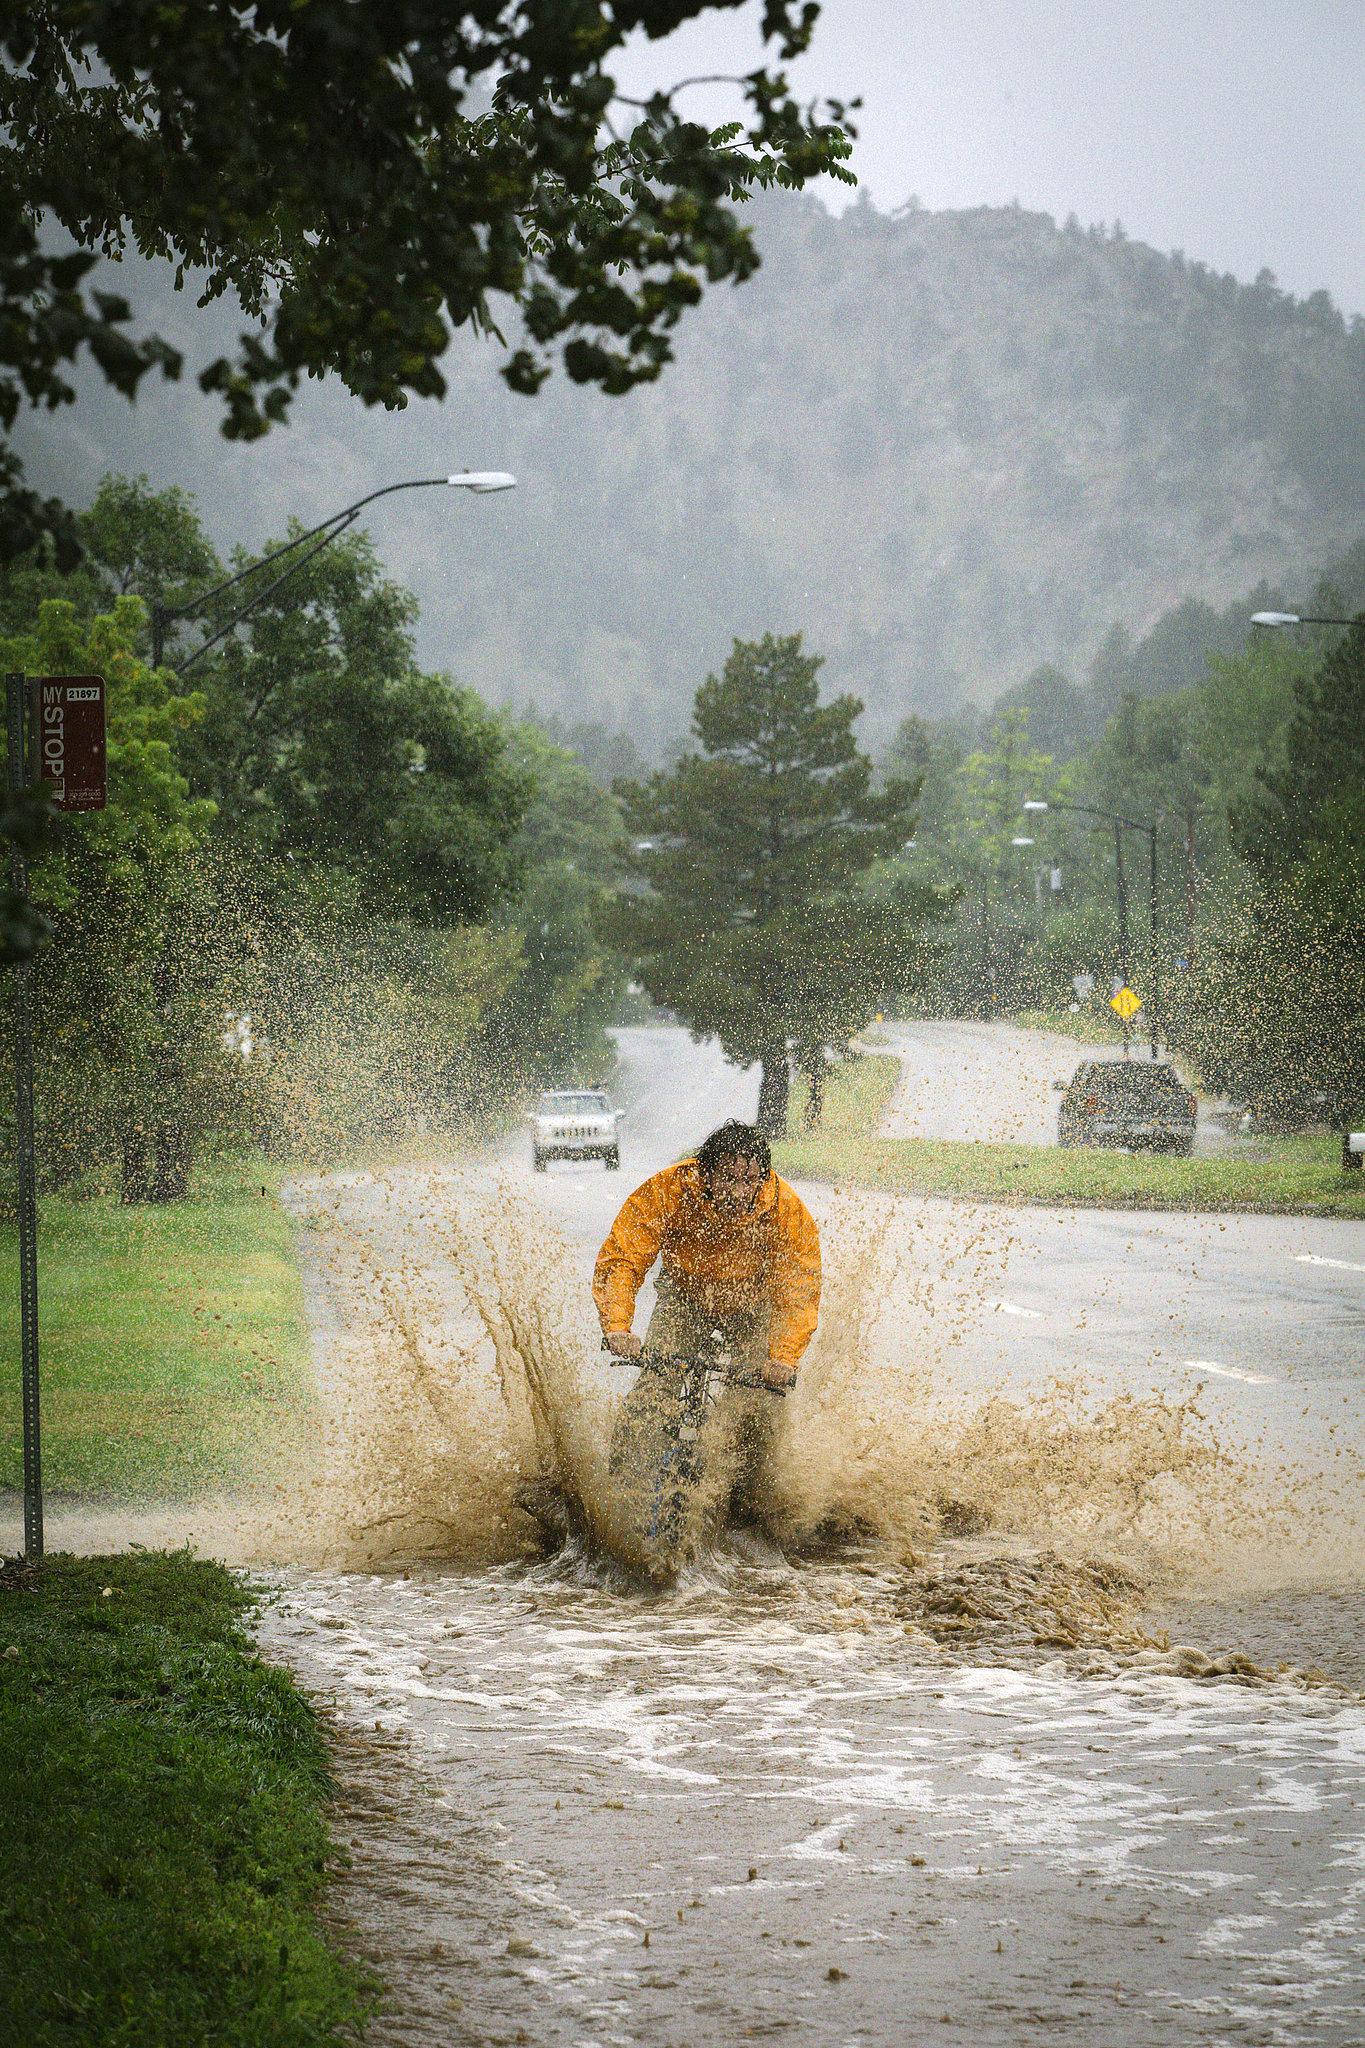 A biker splashed through the street in Boulder, CO.